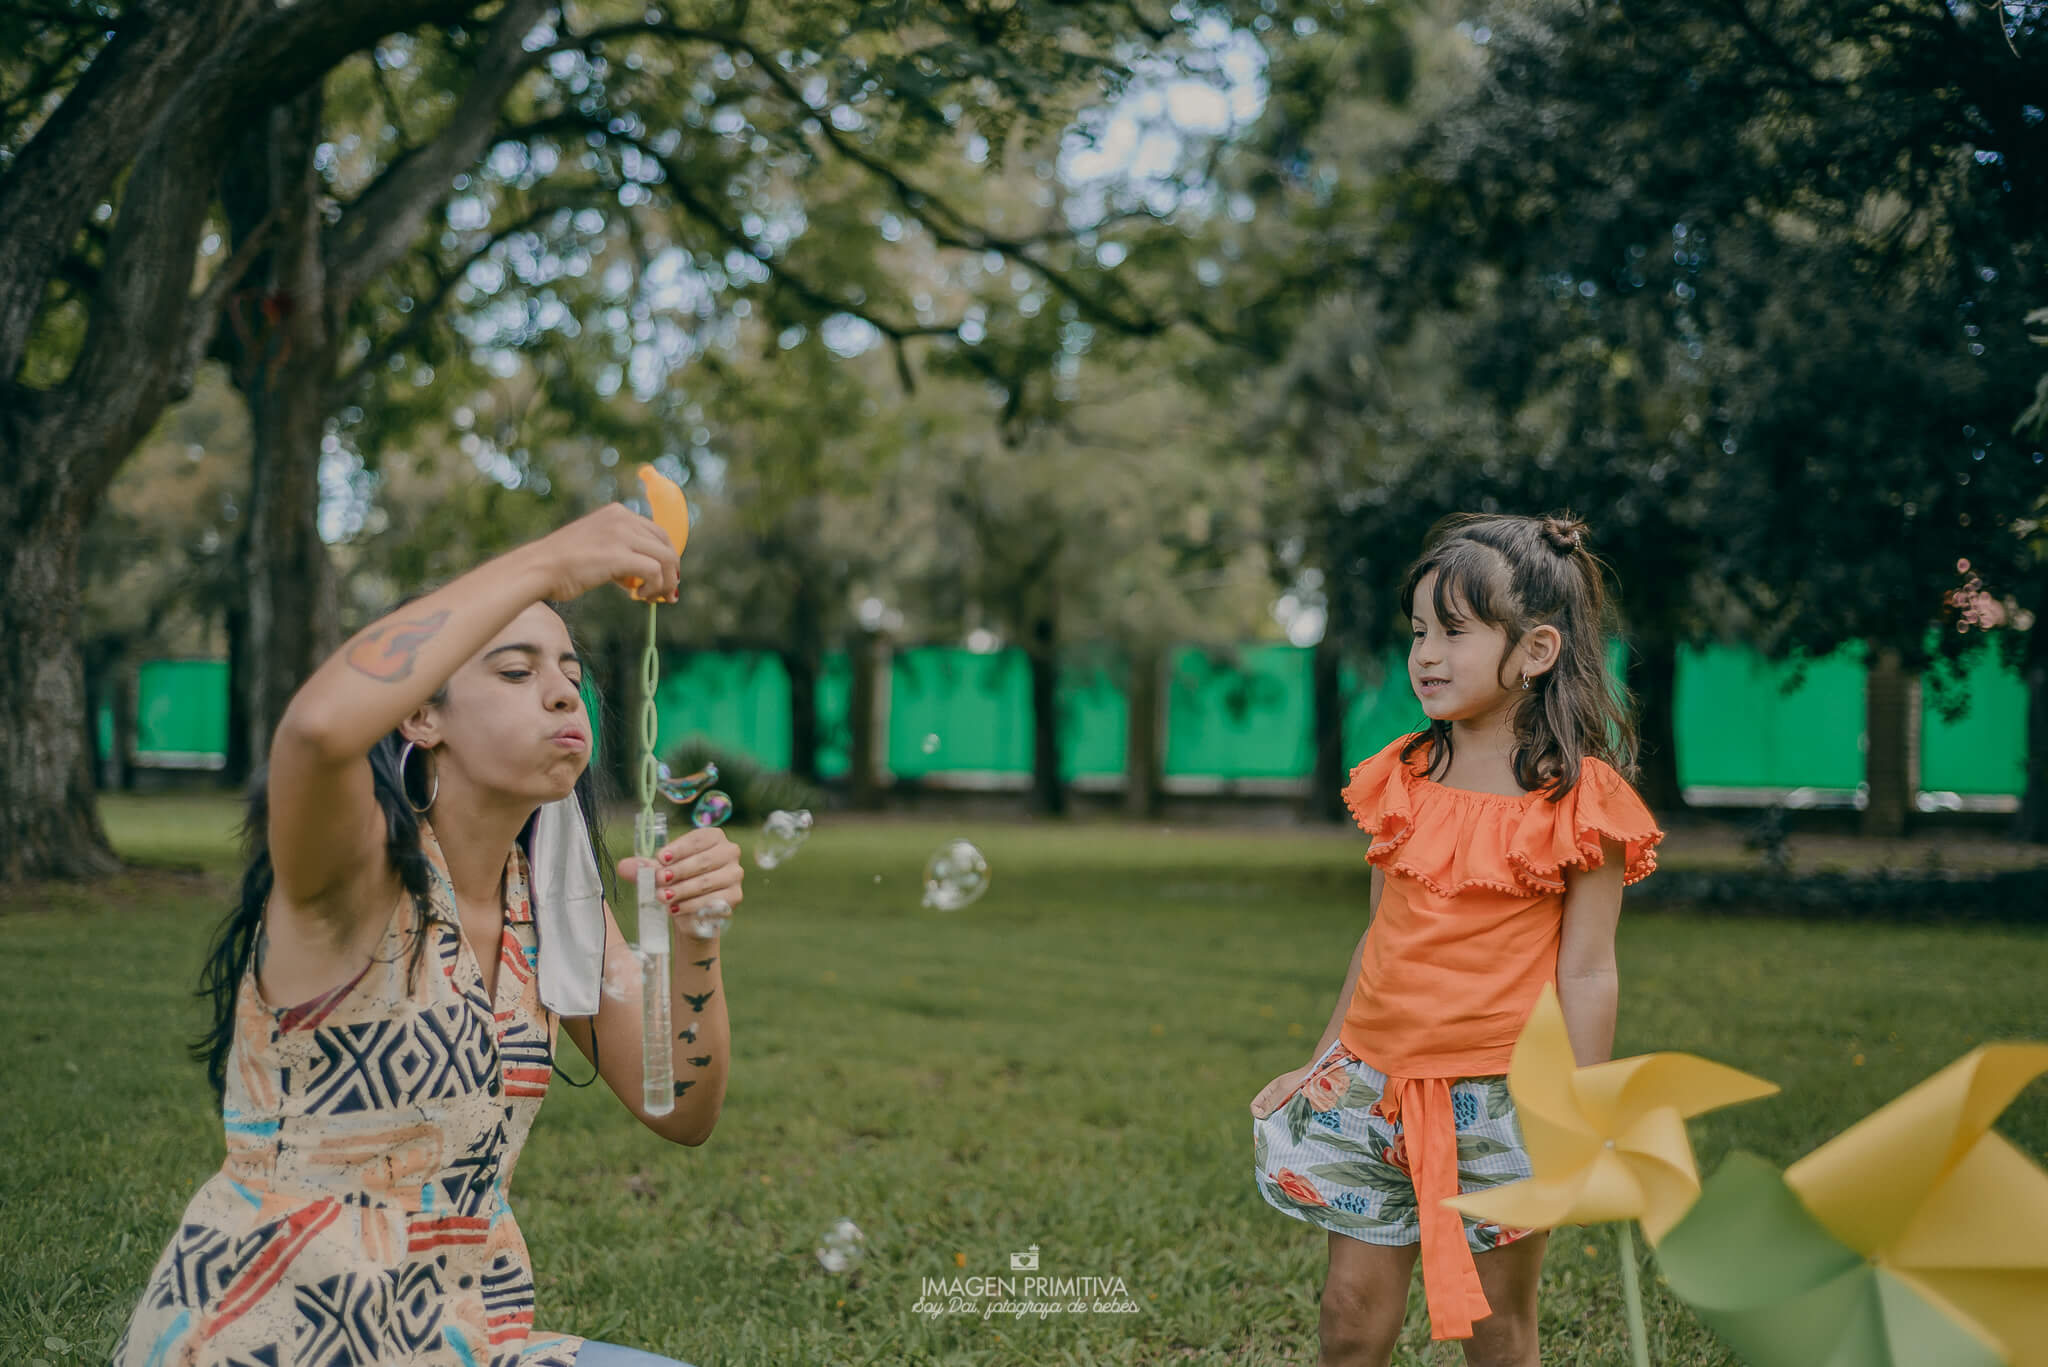 Niña jugando con burbujas para un mini book de fotos en Buenos Aires